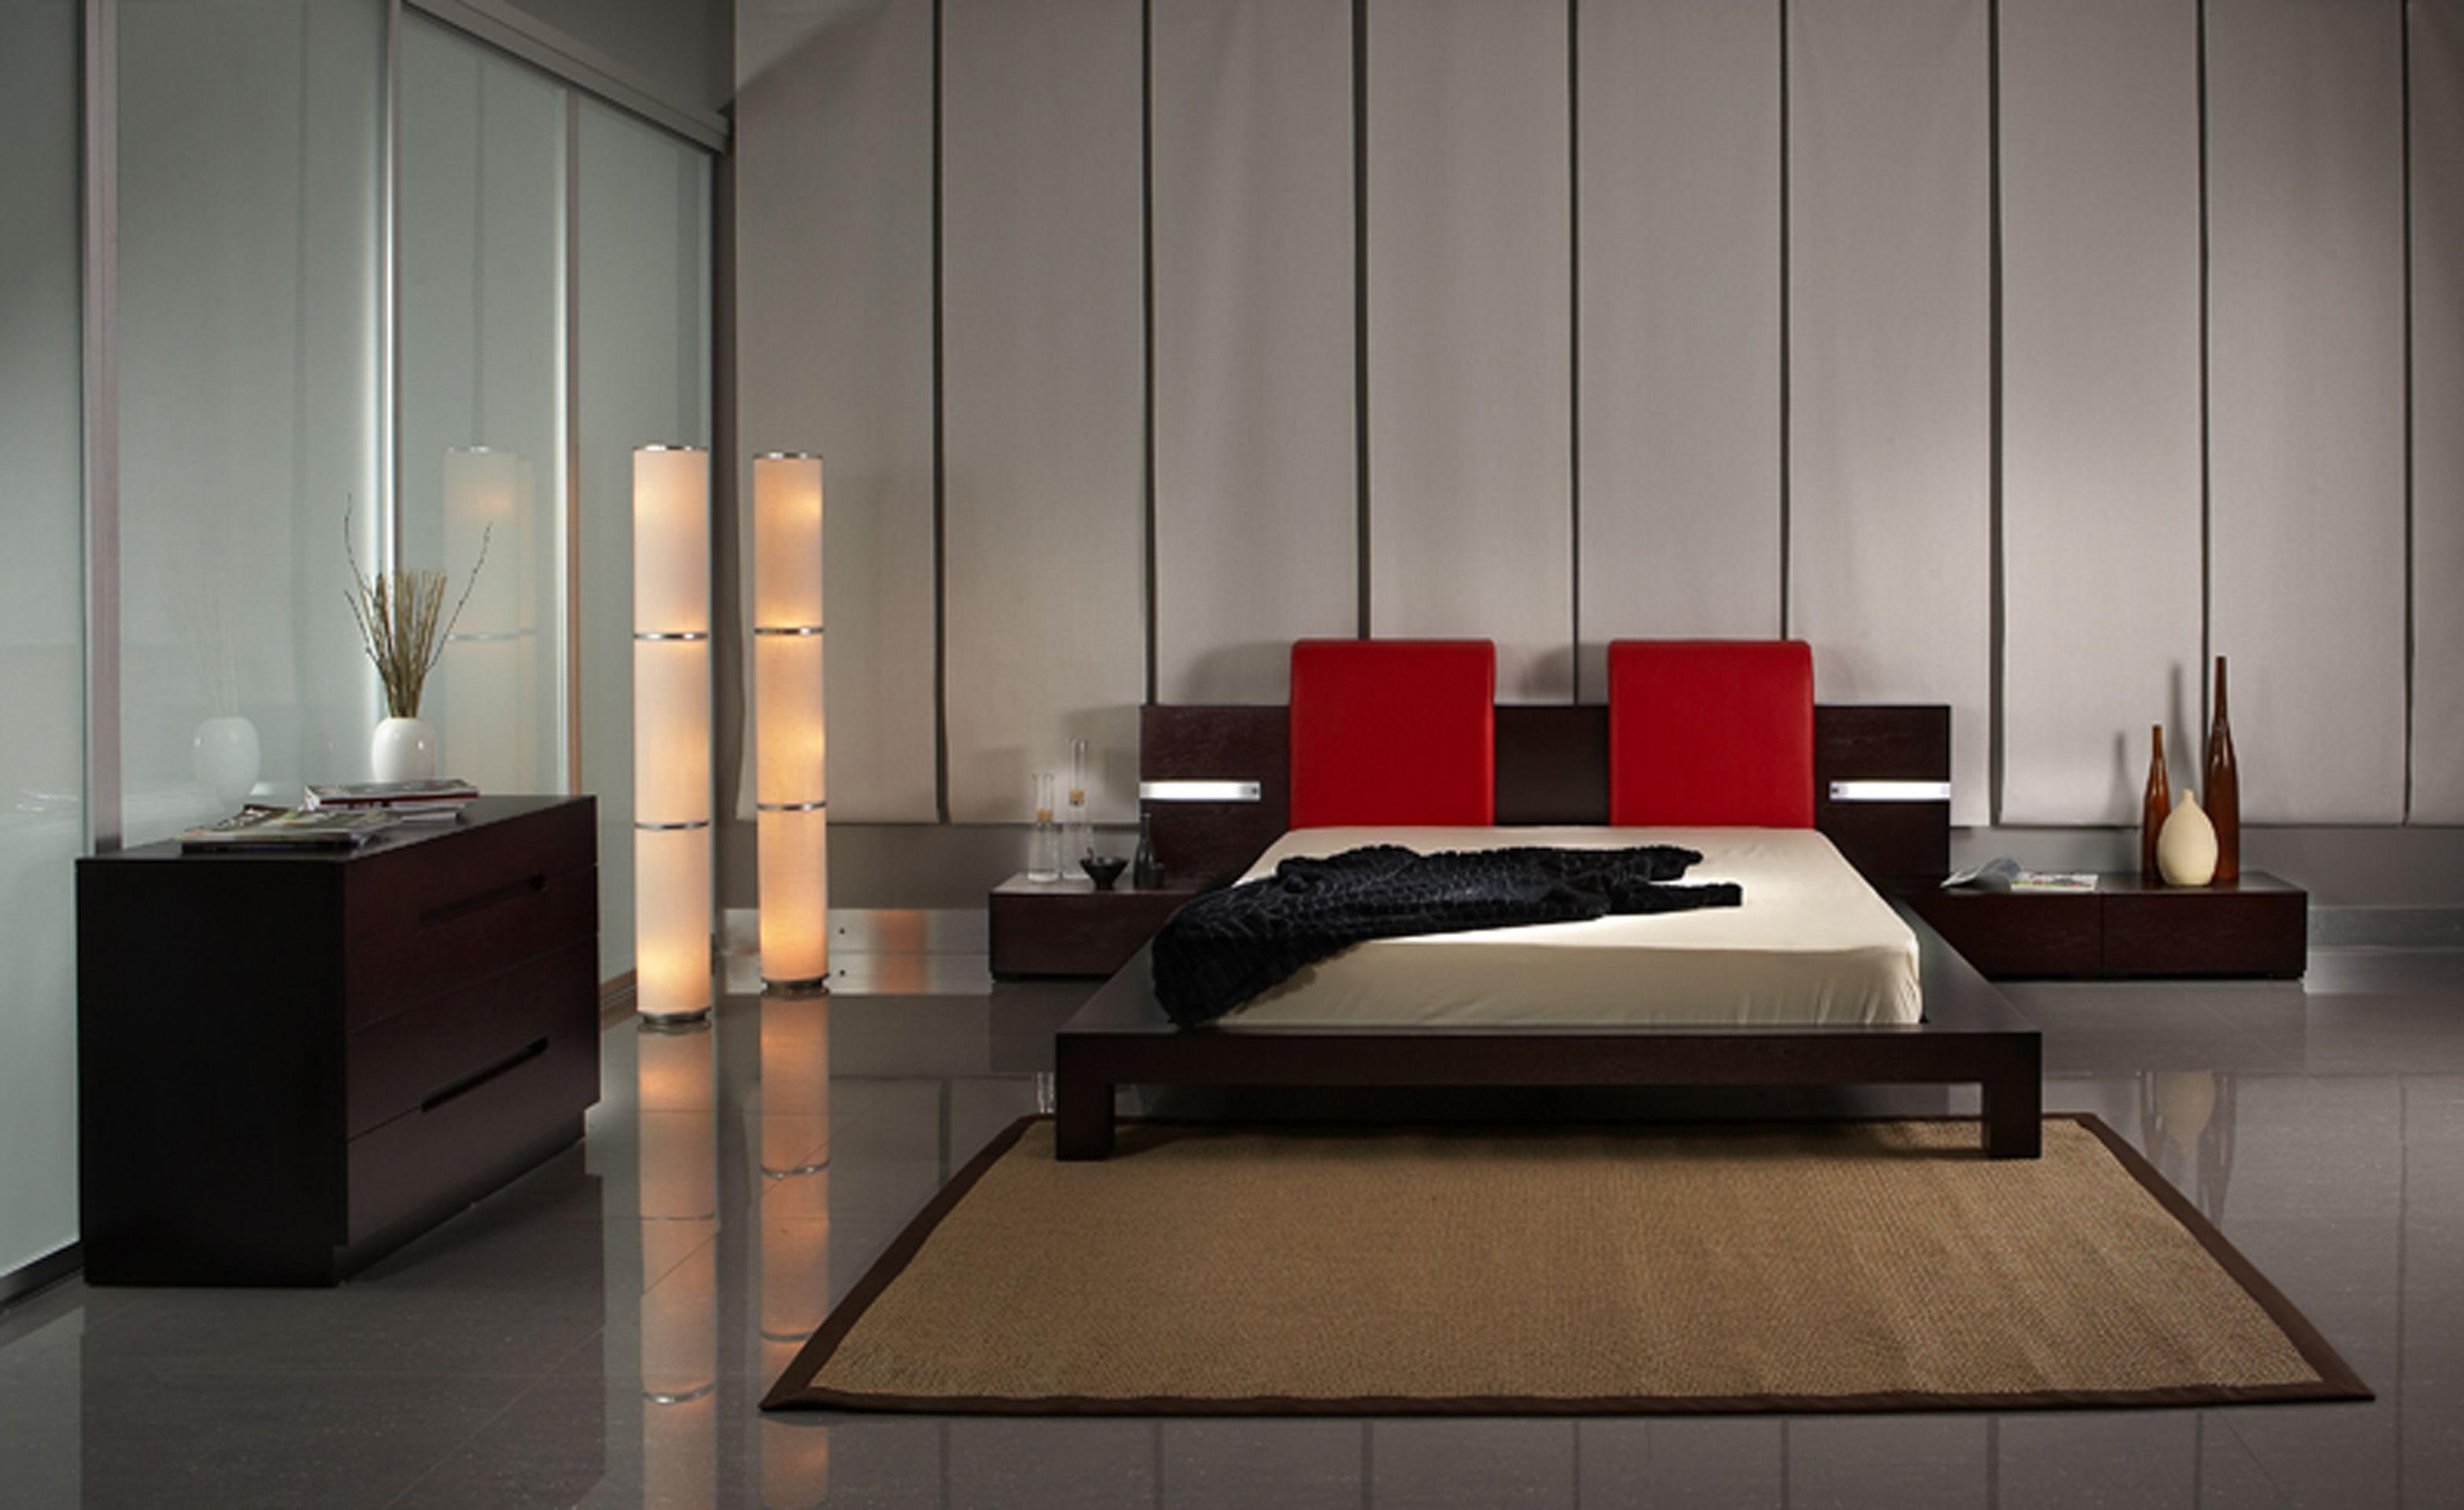 Loft bedroom design ideas  little girl bedroom design ideas loft bedroom design ideas design